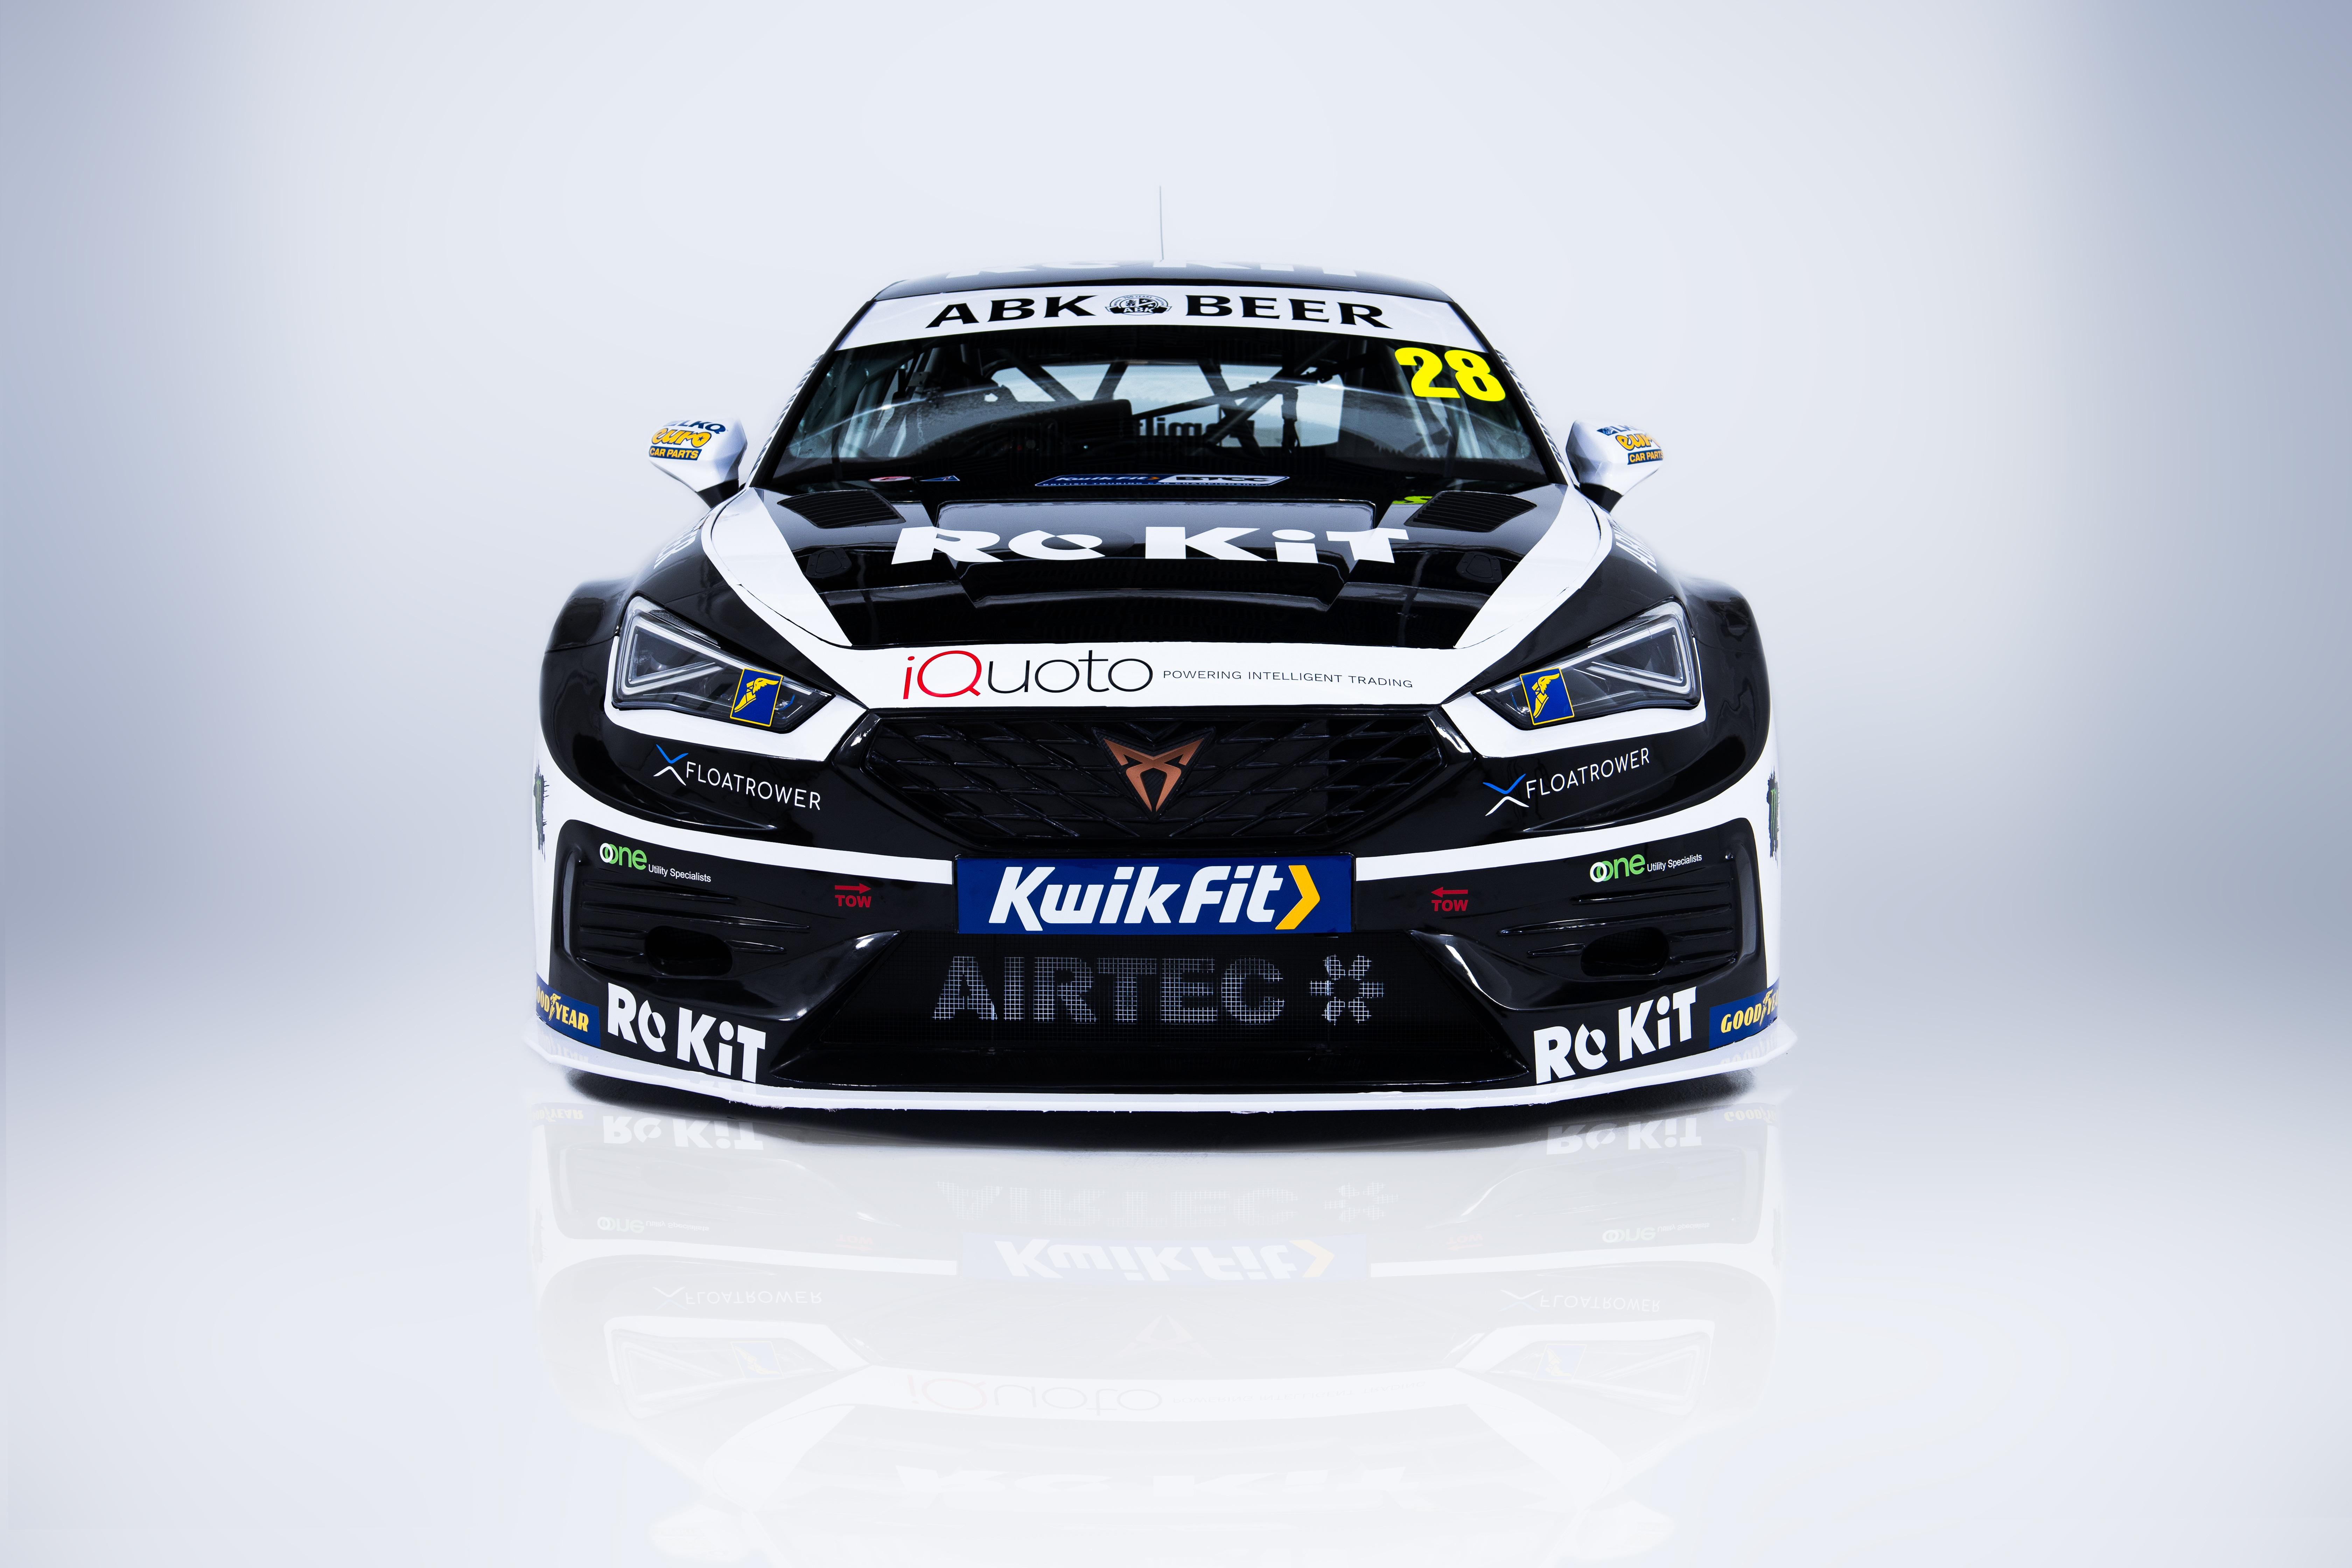 Nic Hamilton Team Hard Cupra BTCC 2021